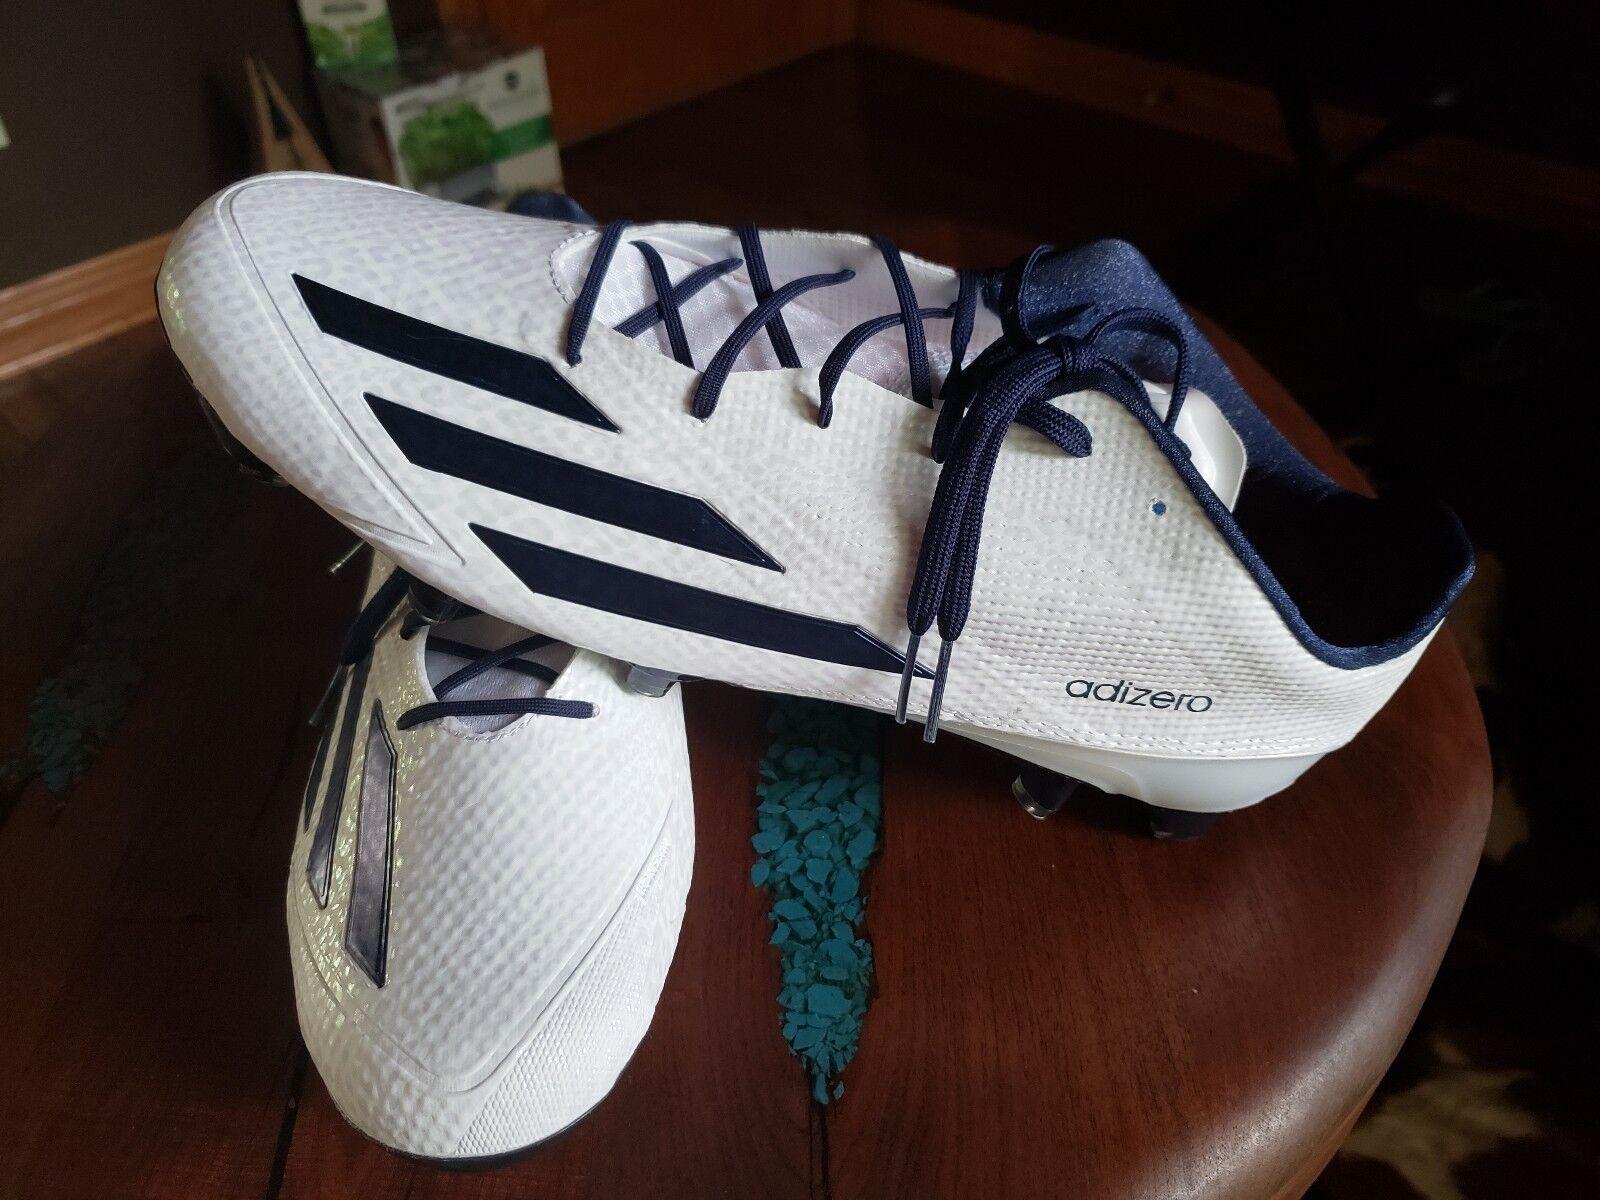 Adidas Adizero 5 Star 5.0 Football Cleats AQ8737 White  Navy size 14